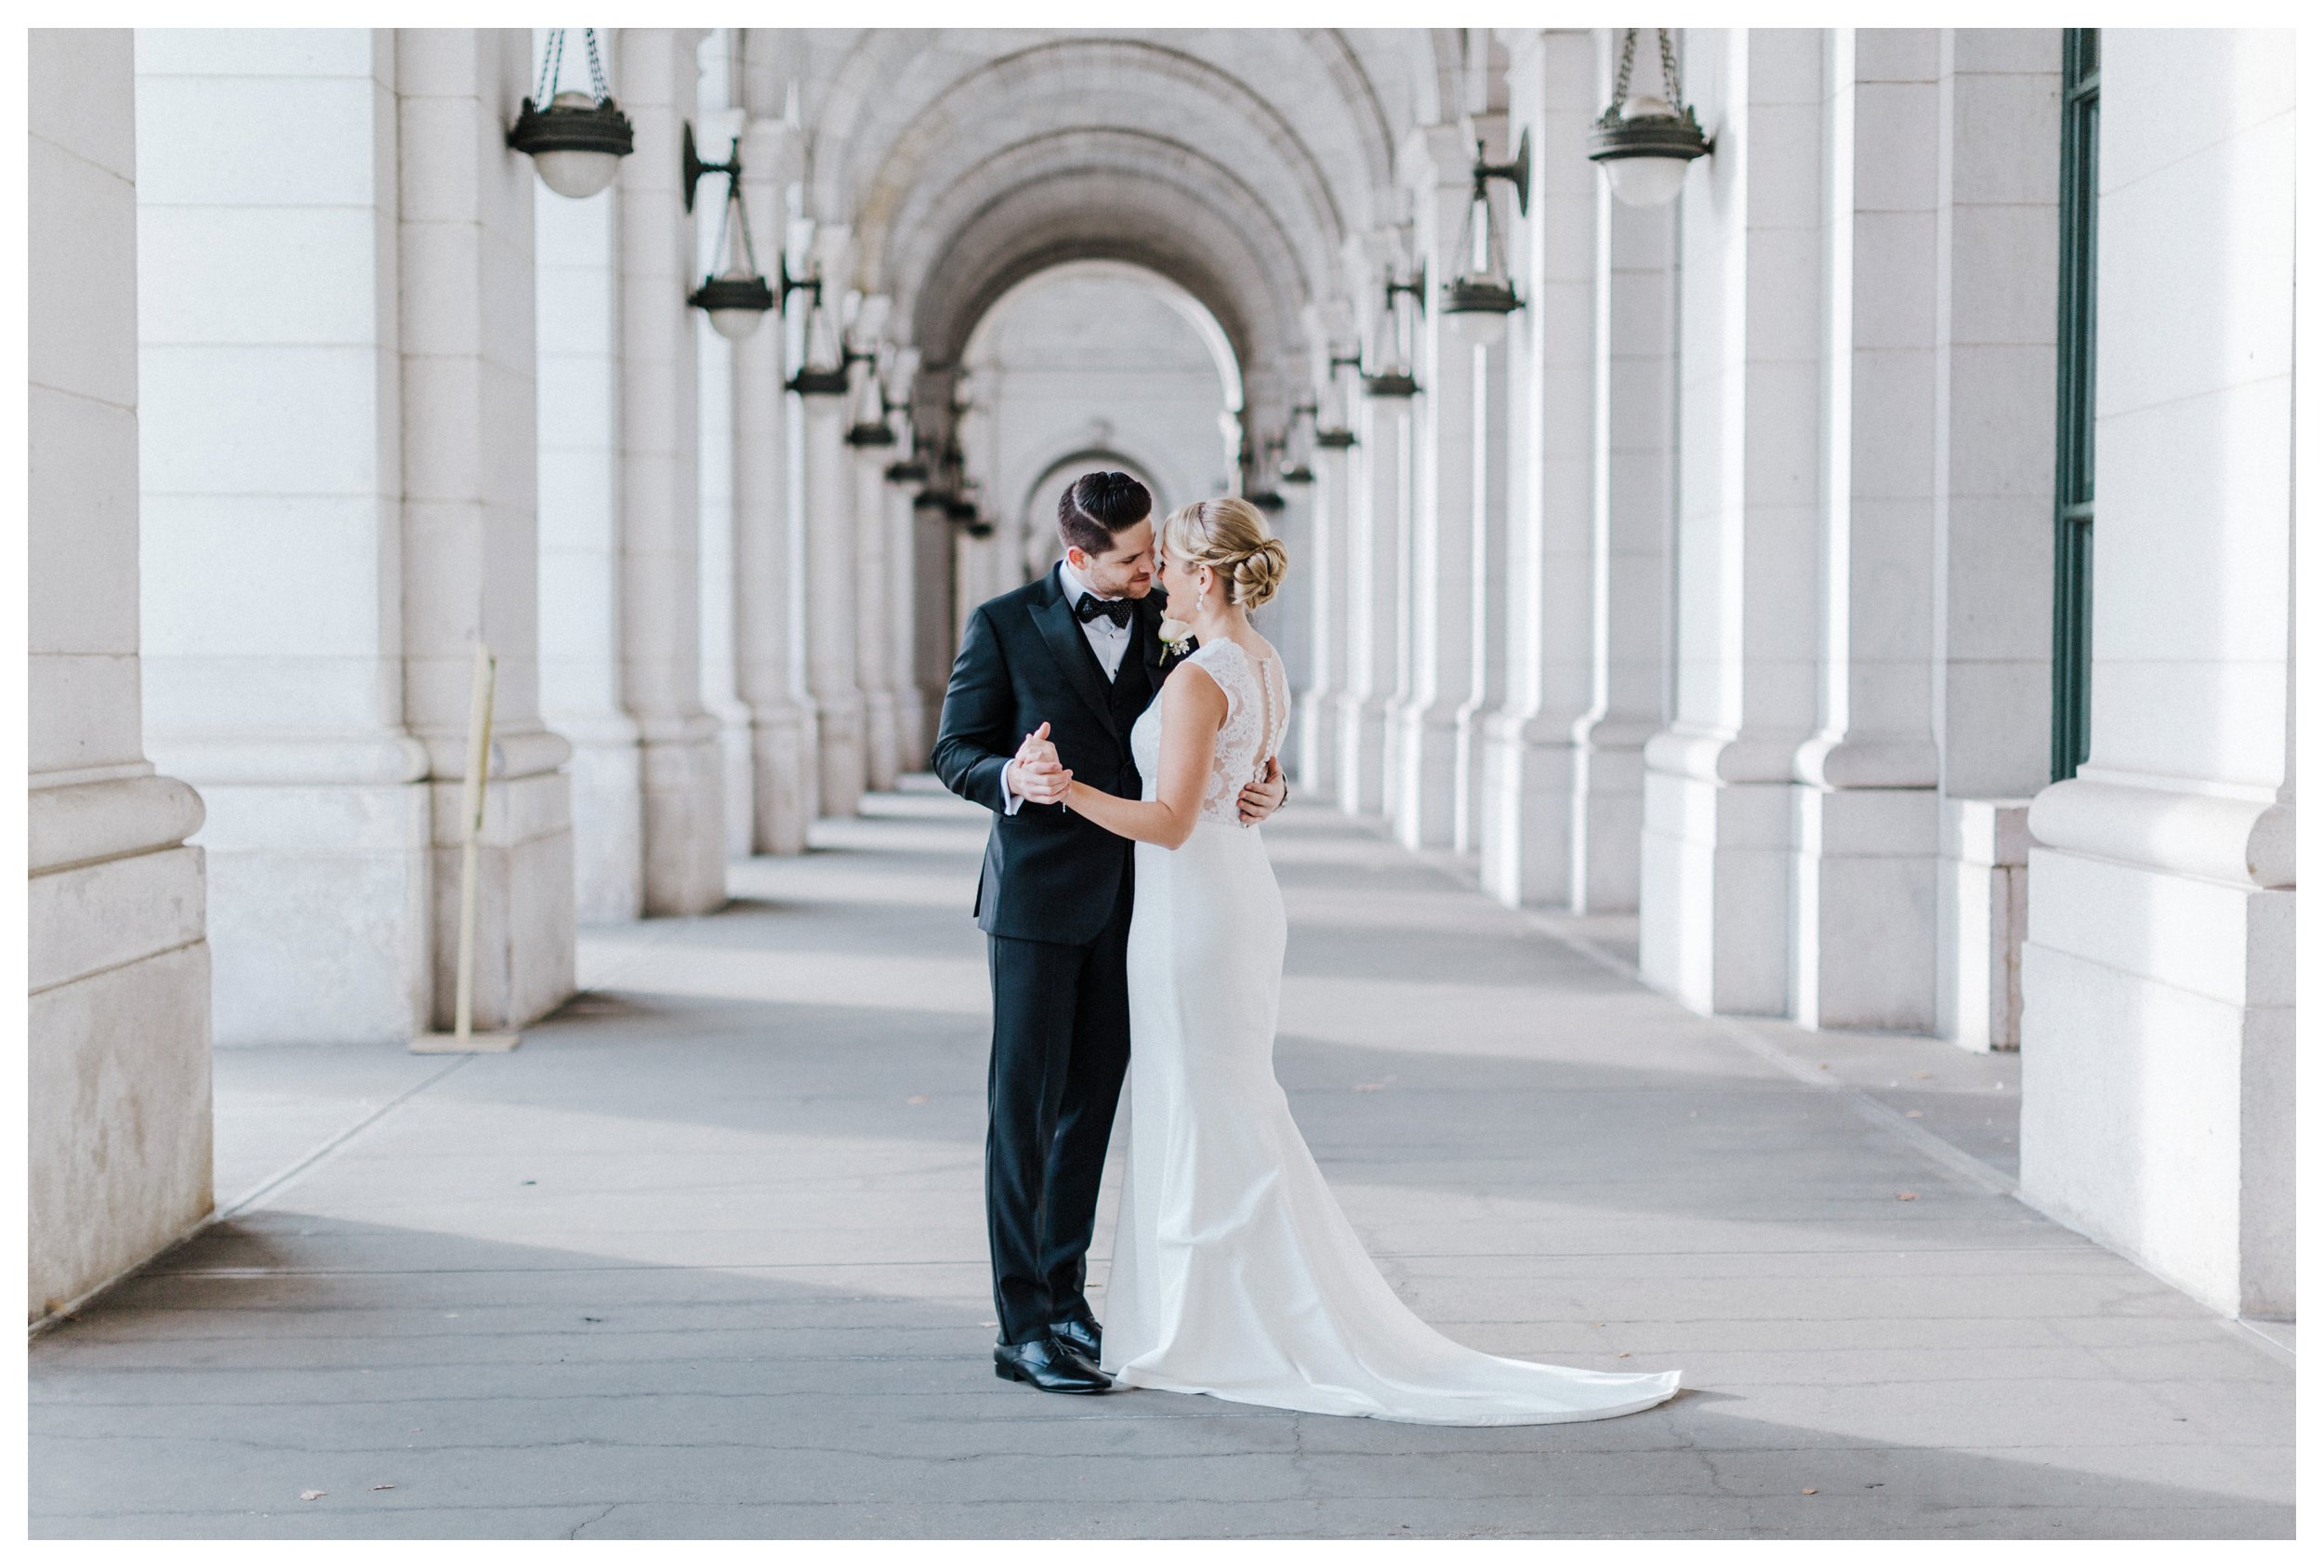 washington-dc-wedding-photographer-17.JPG